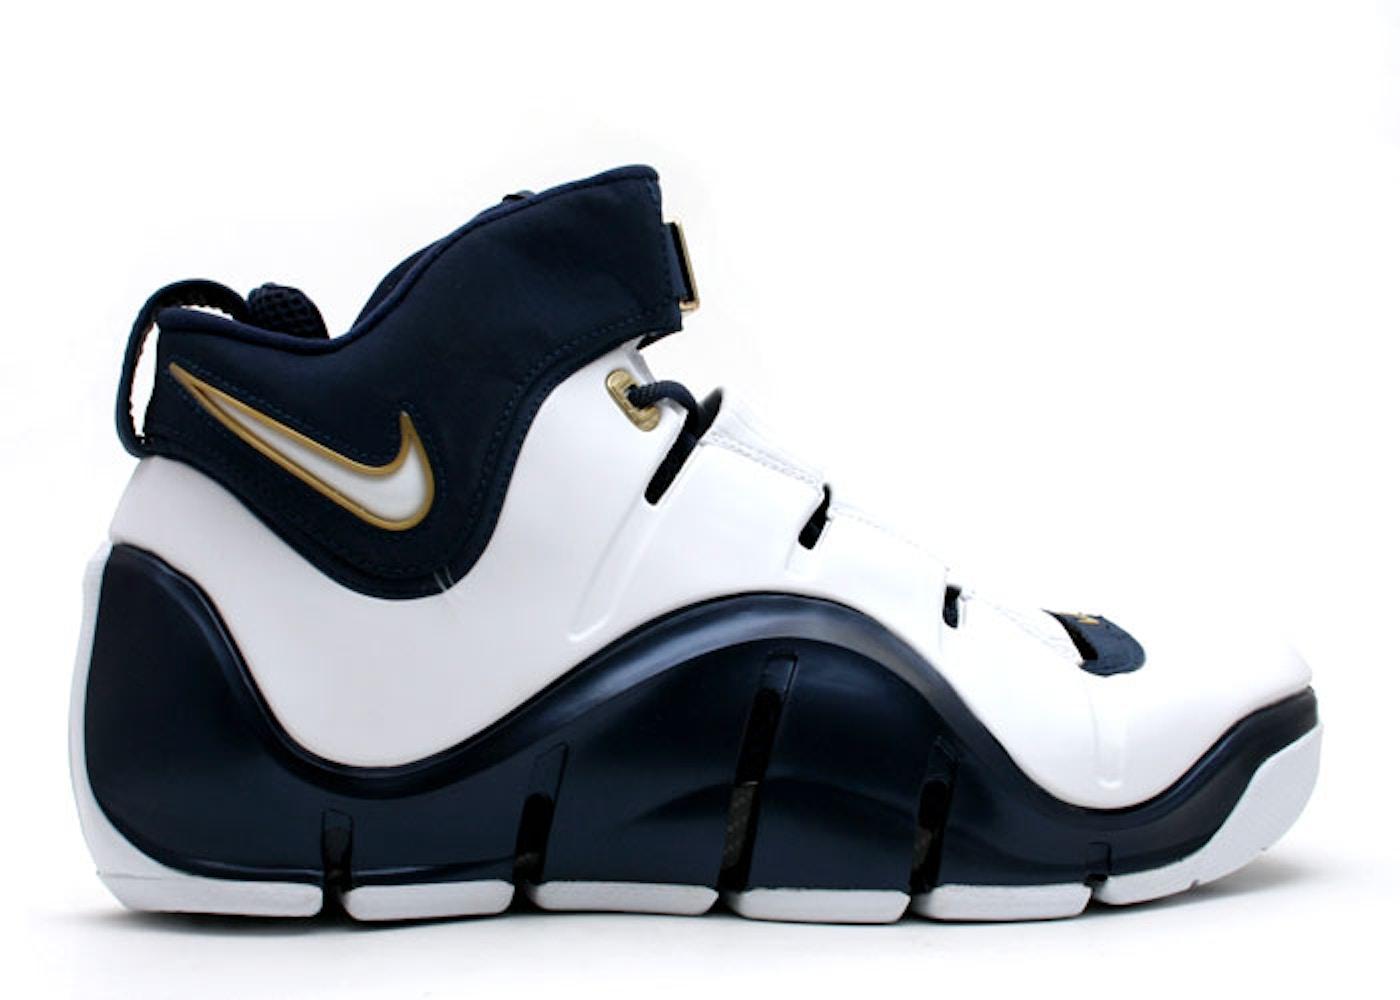 6cd9e334970 Nike LeBron 4 Shoes - Release Date